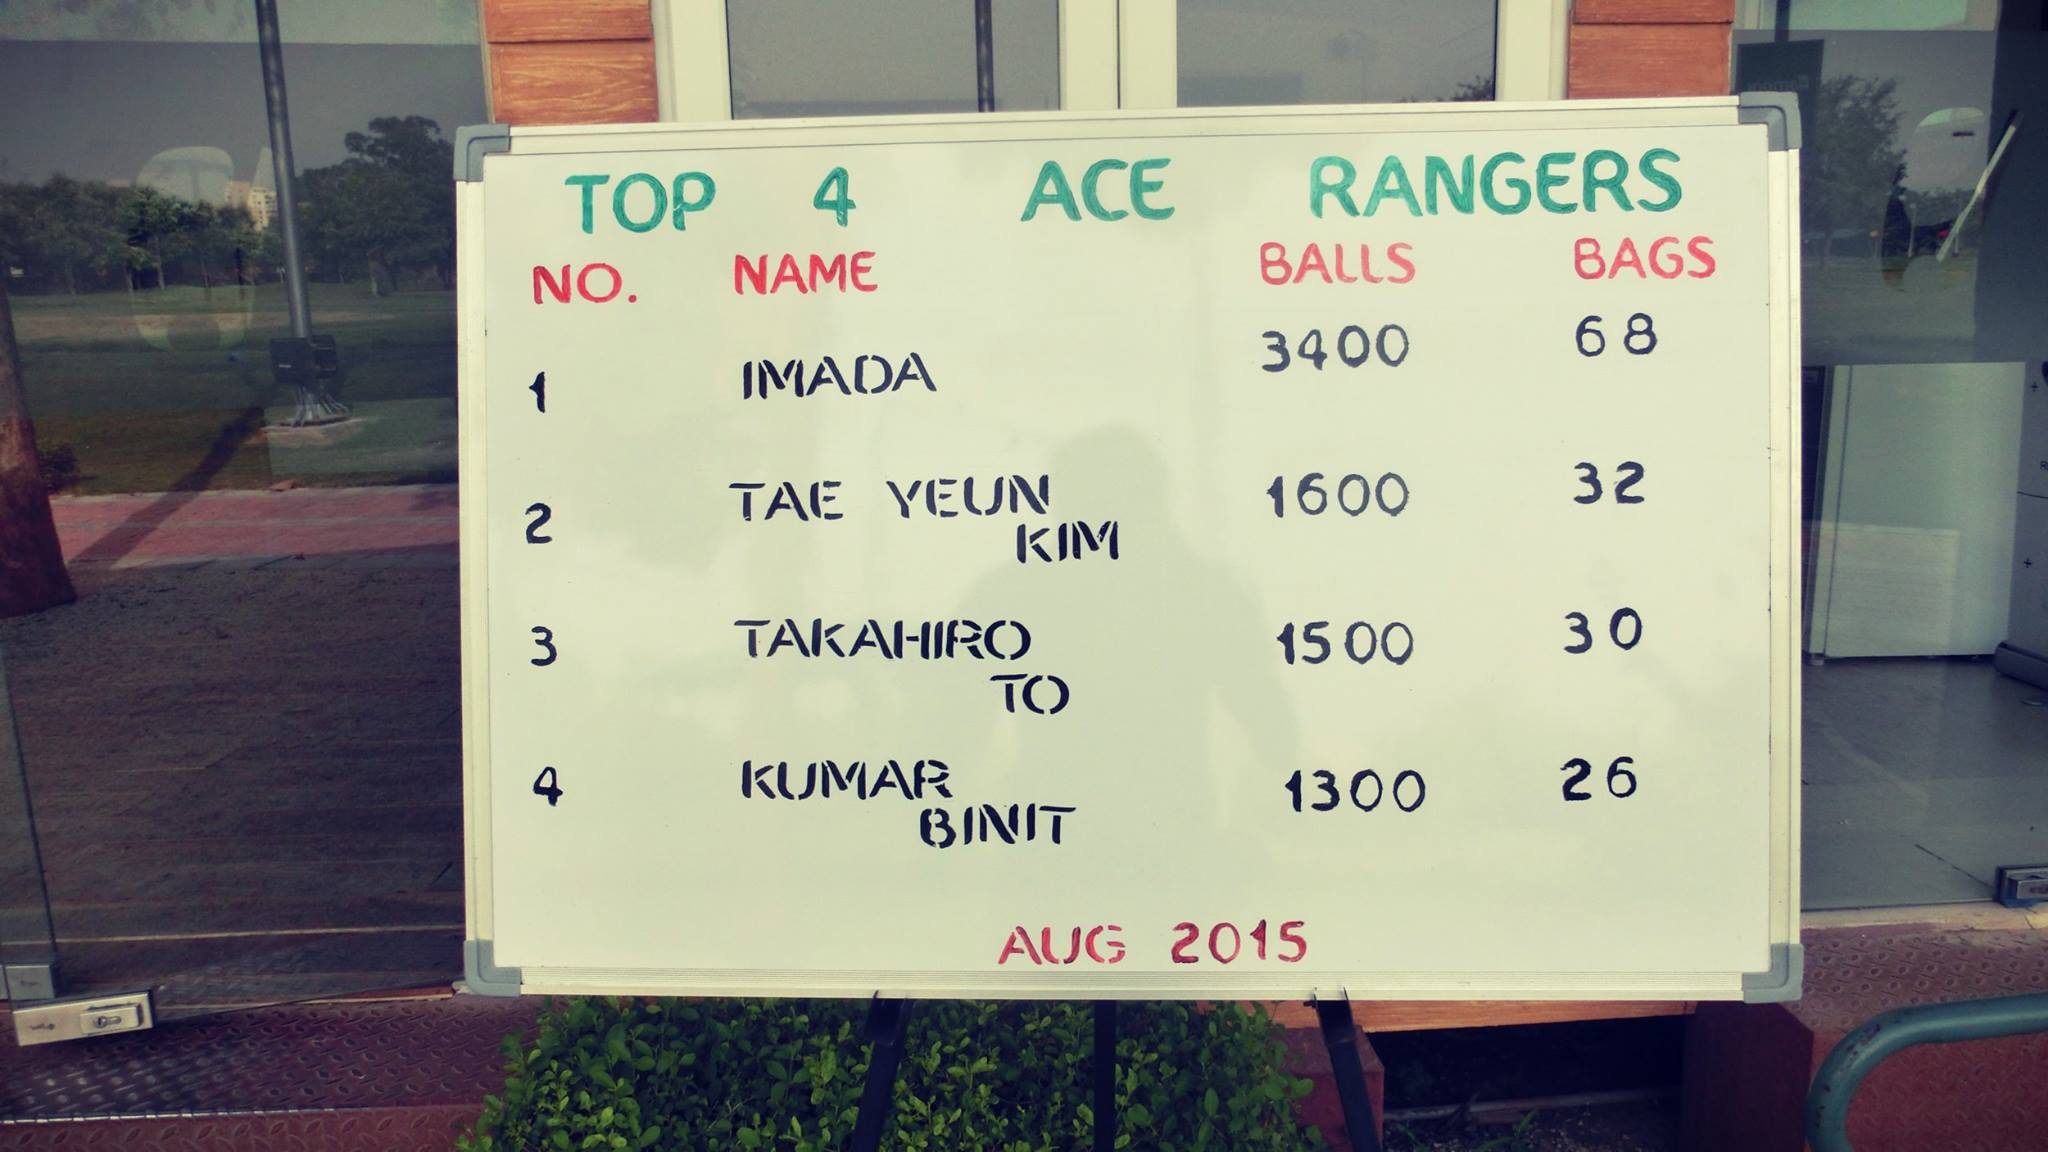 Our August'15 Hamoni Ace Ranger!